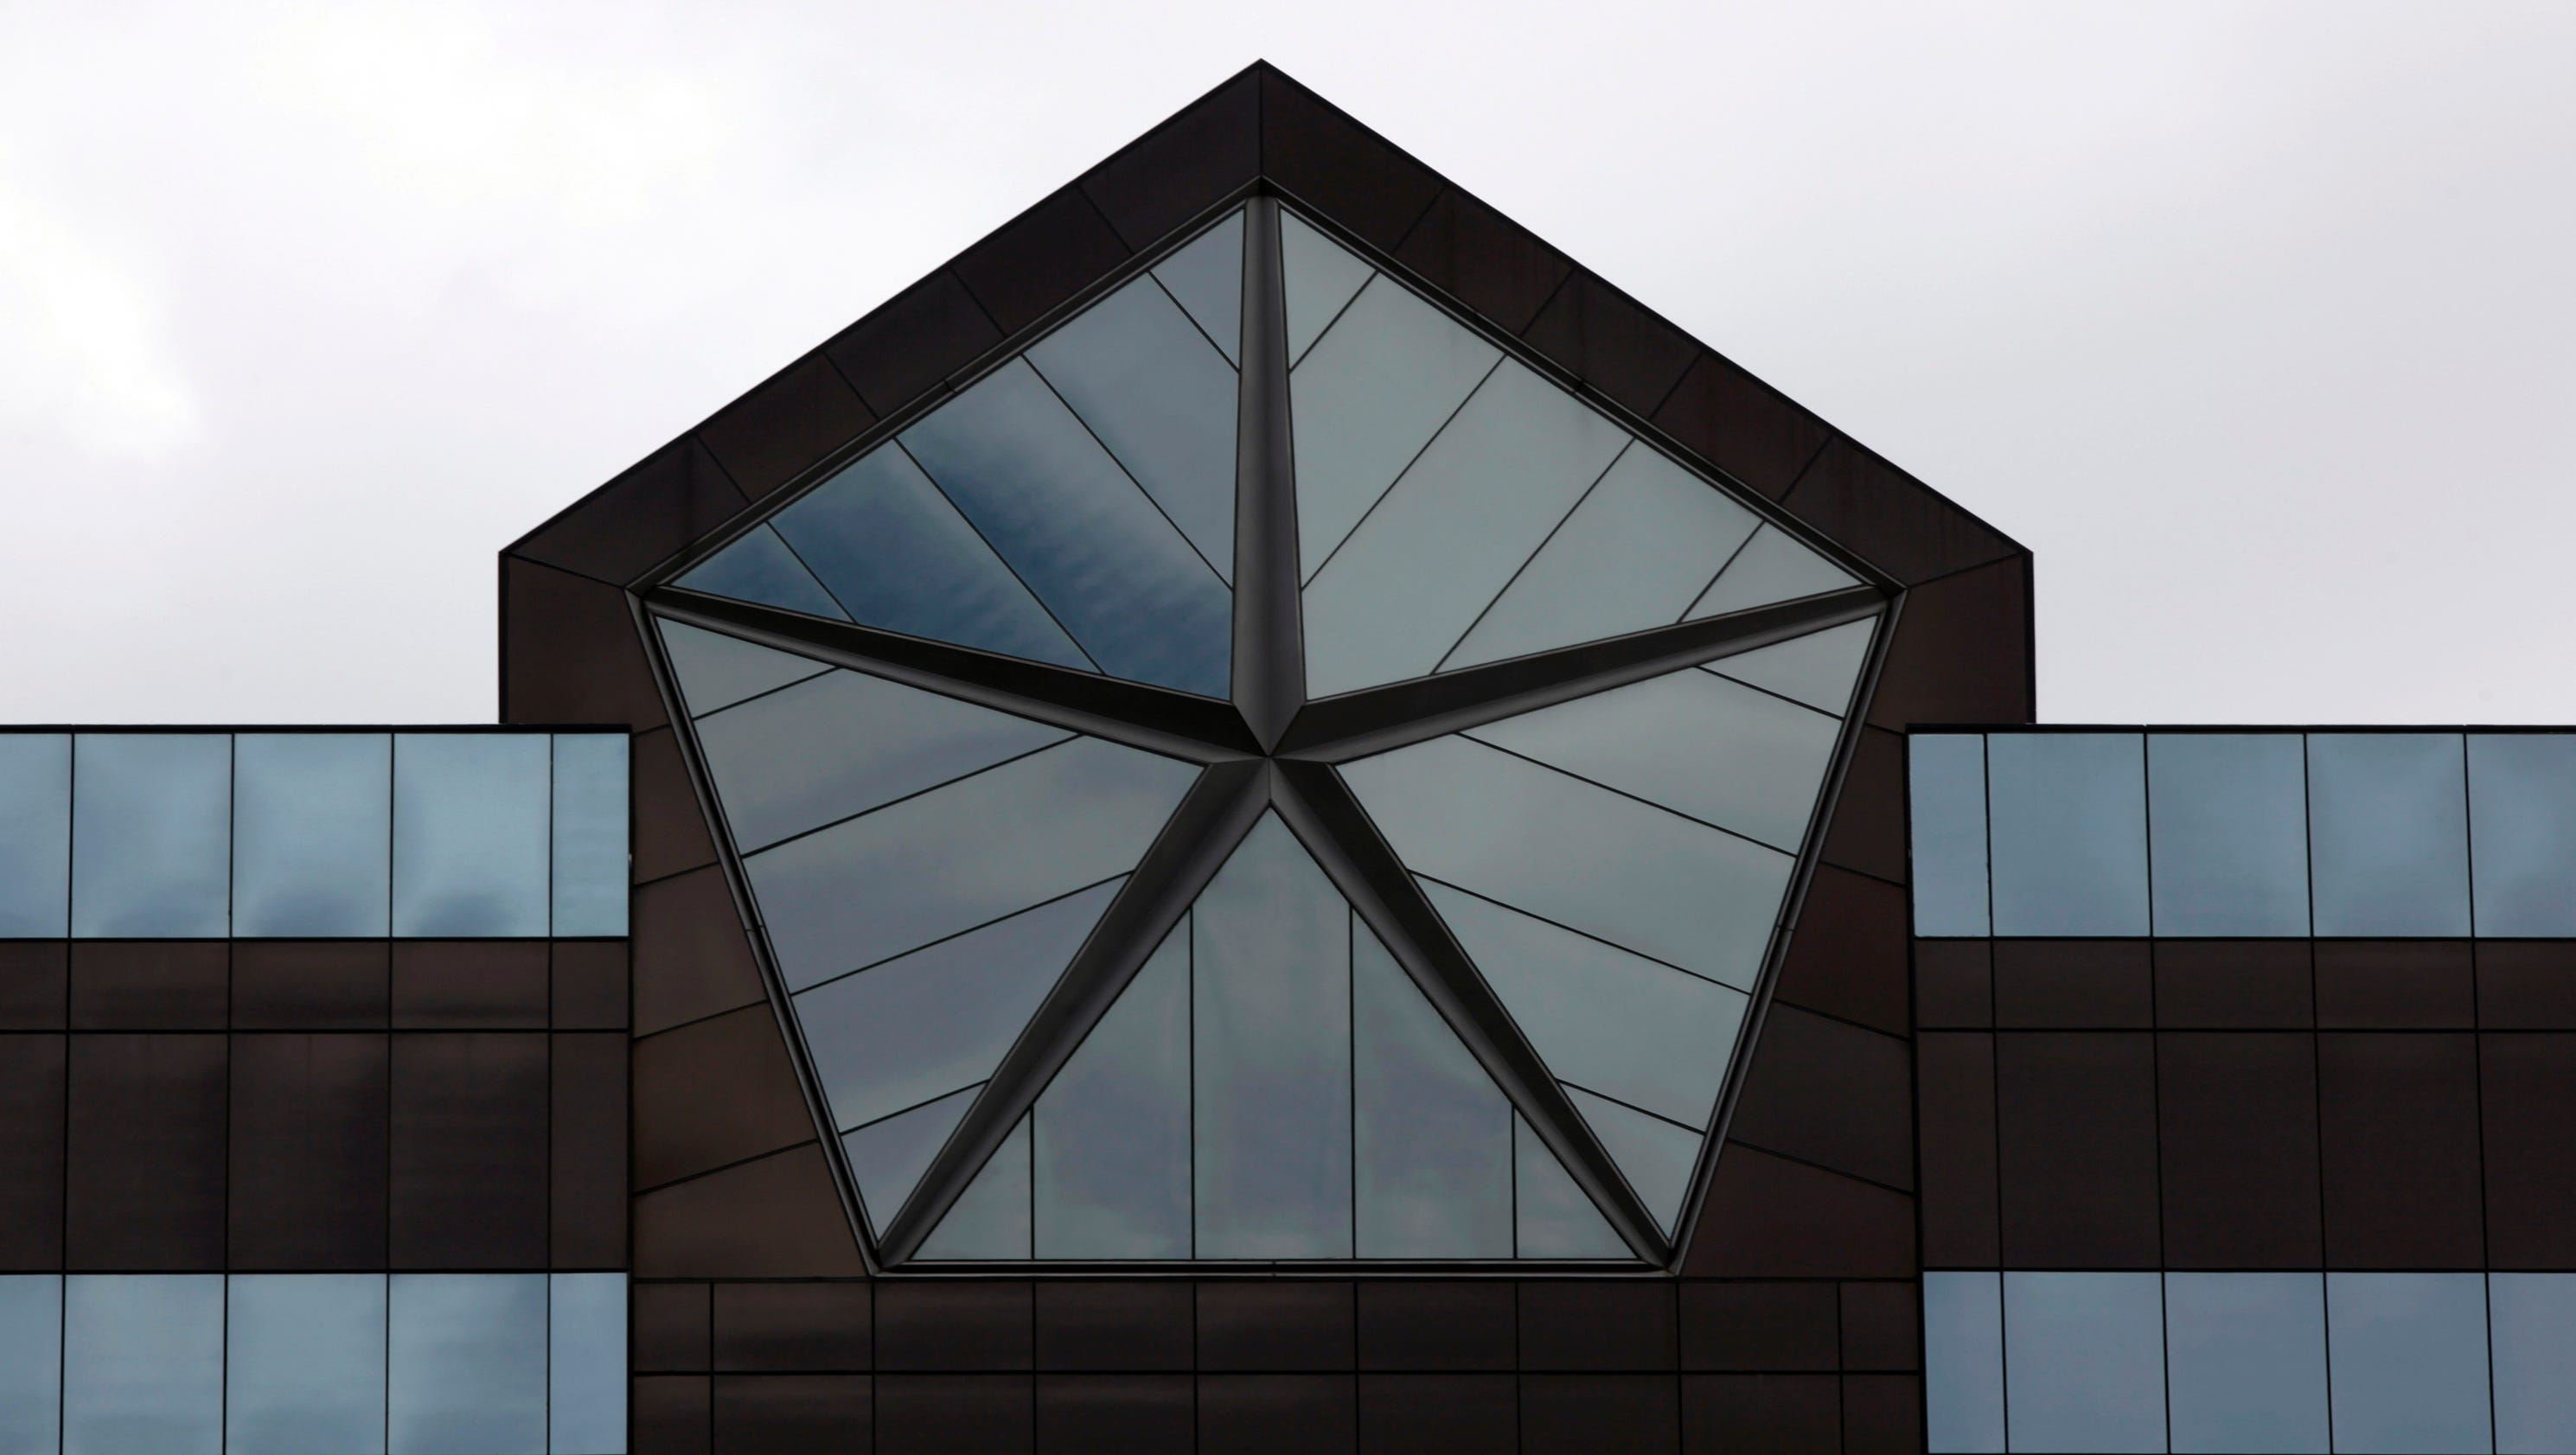 Chryslers pentastar going away for new fca logo biocorpaavc